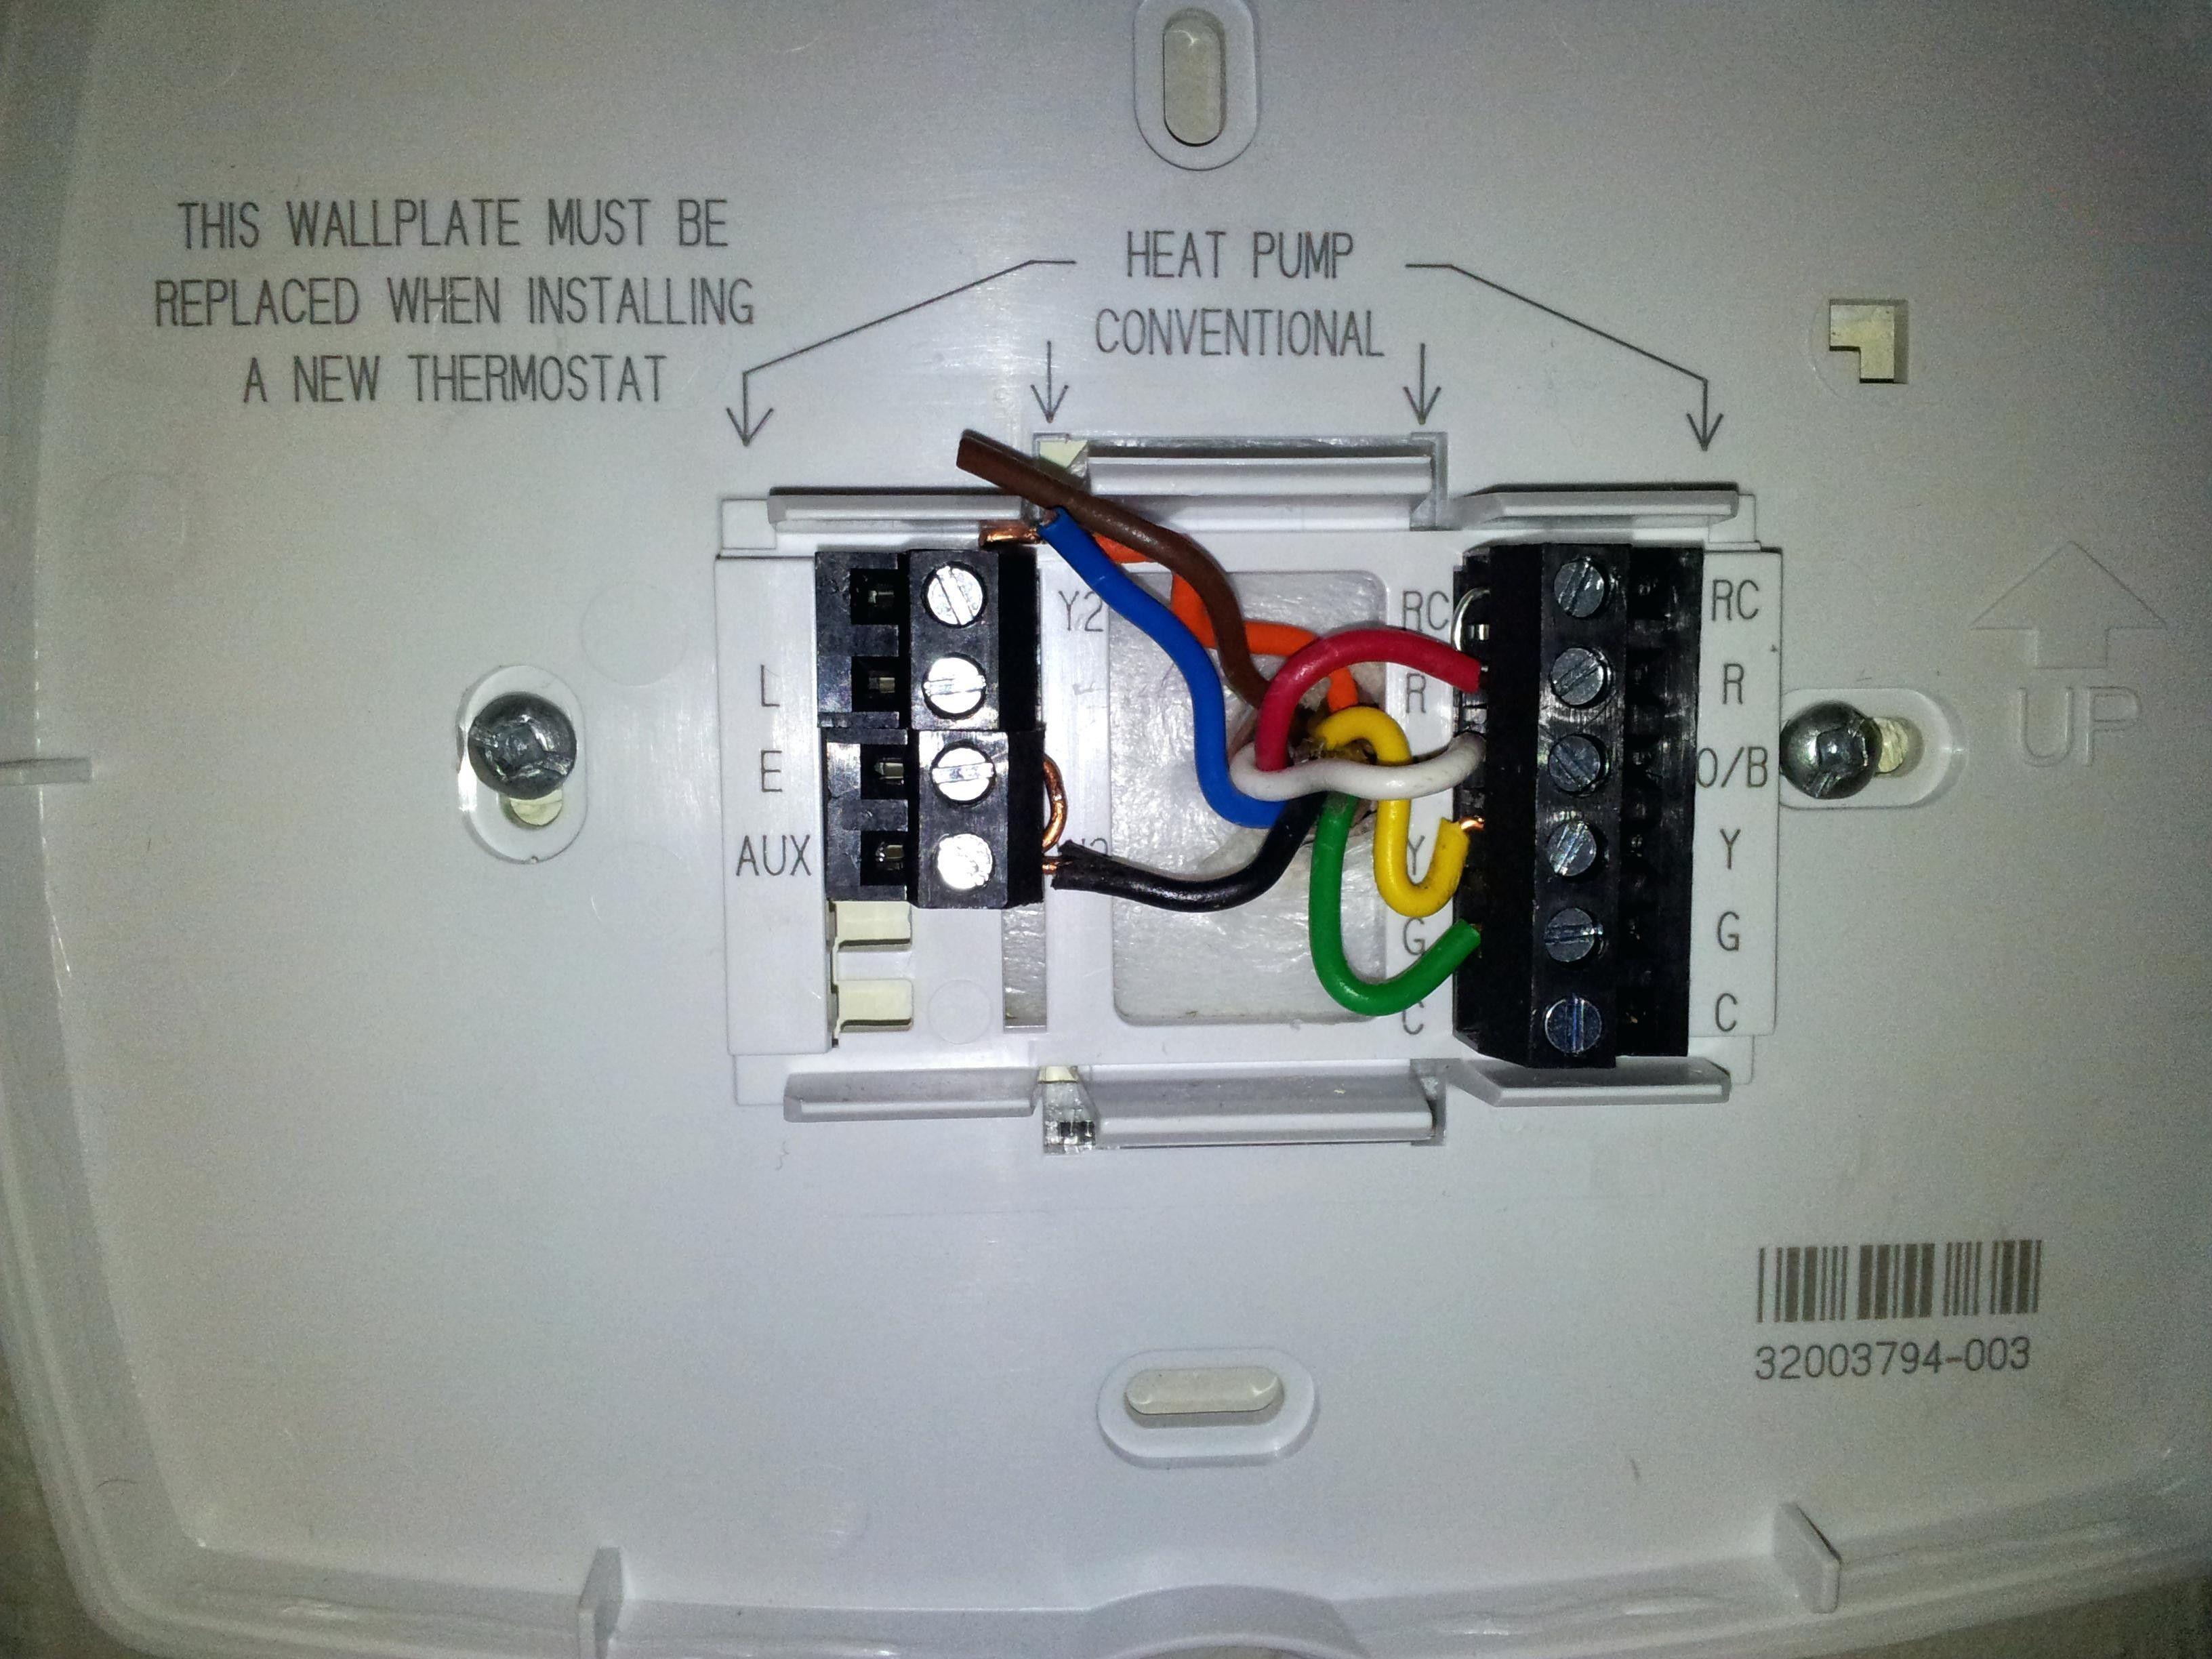 unique honeywell thermostat th8321u1006 wiring diagram #diagram  #diagramsample #diagramtemplate #wiringdiagr… | honeywell thermostats,  thermostat, thermostat wiring  pinterest